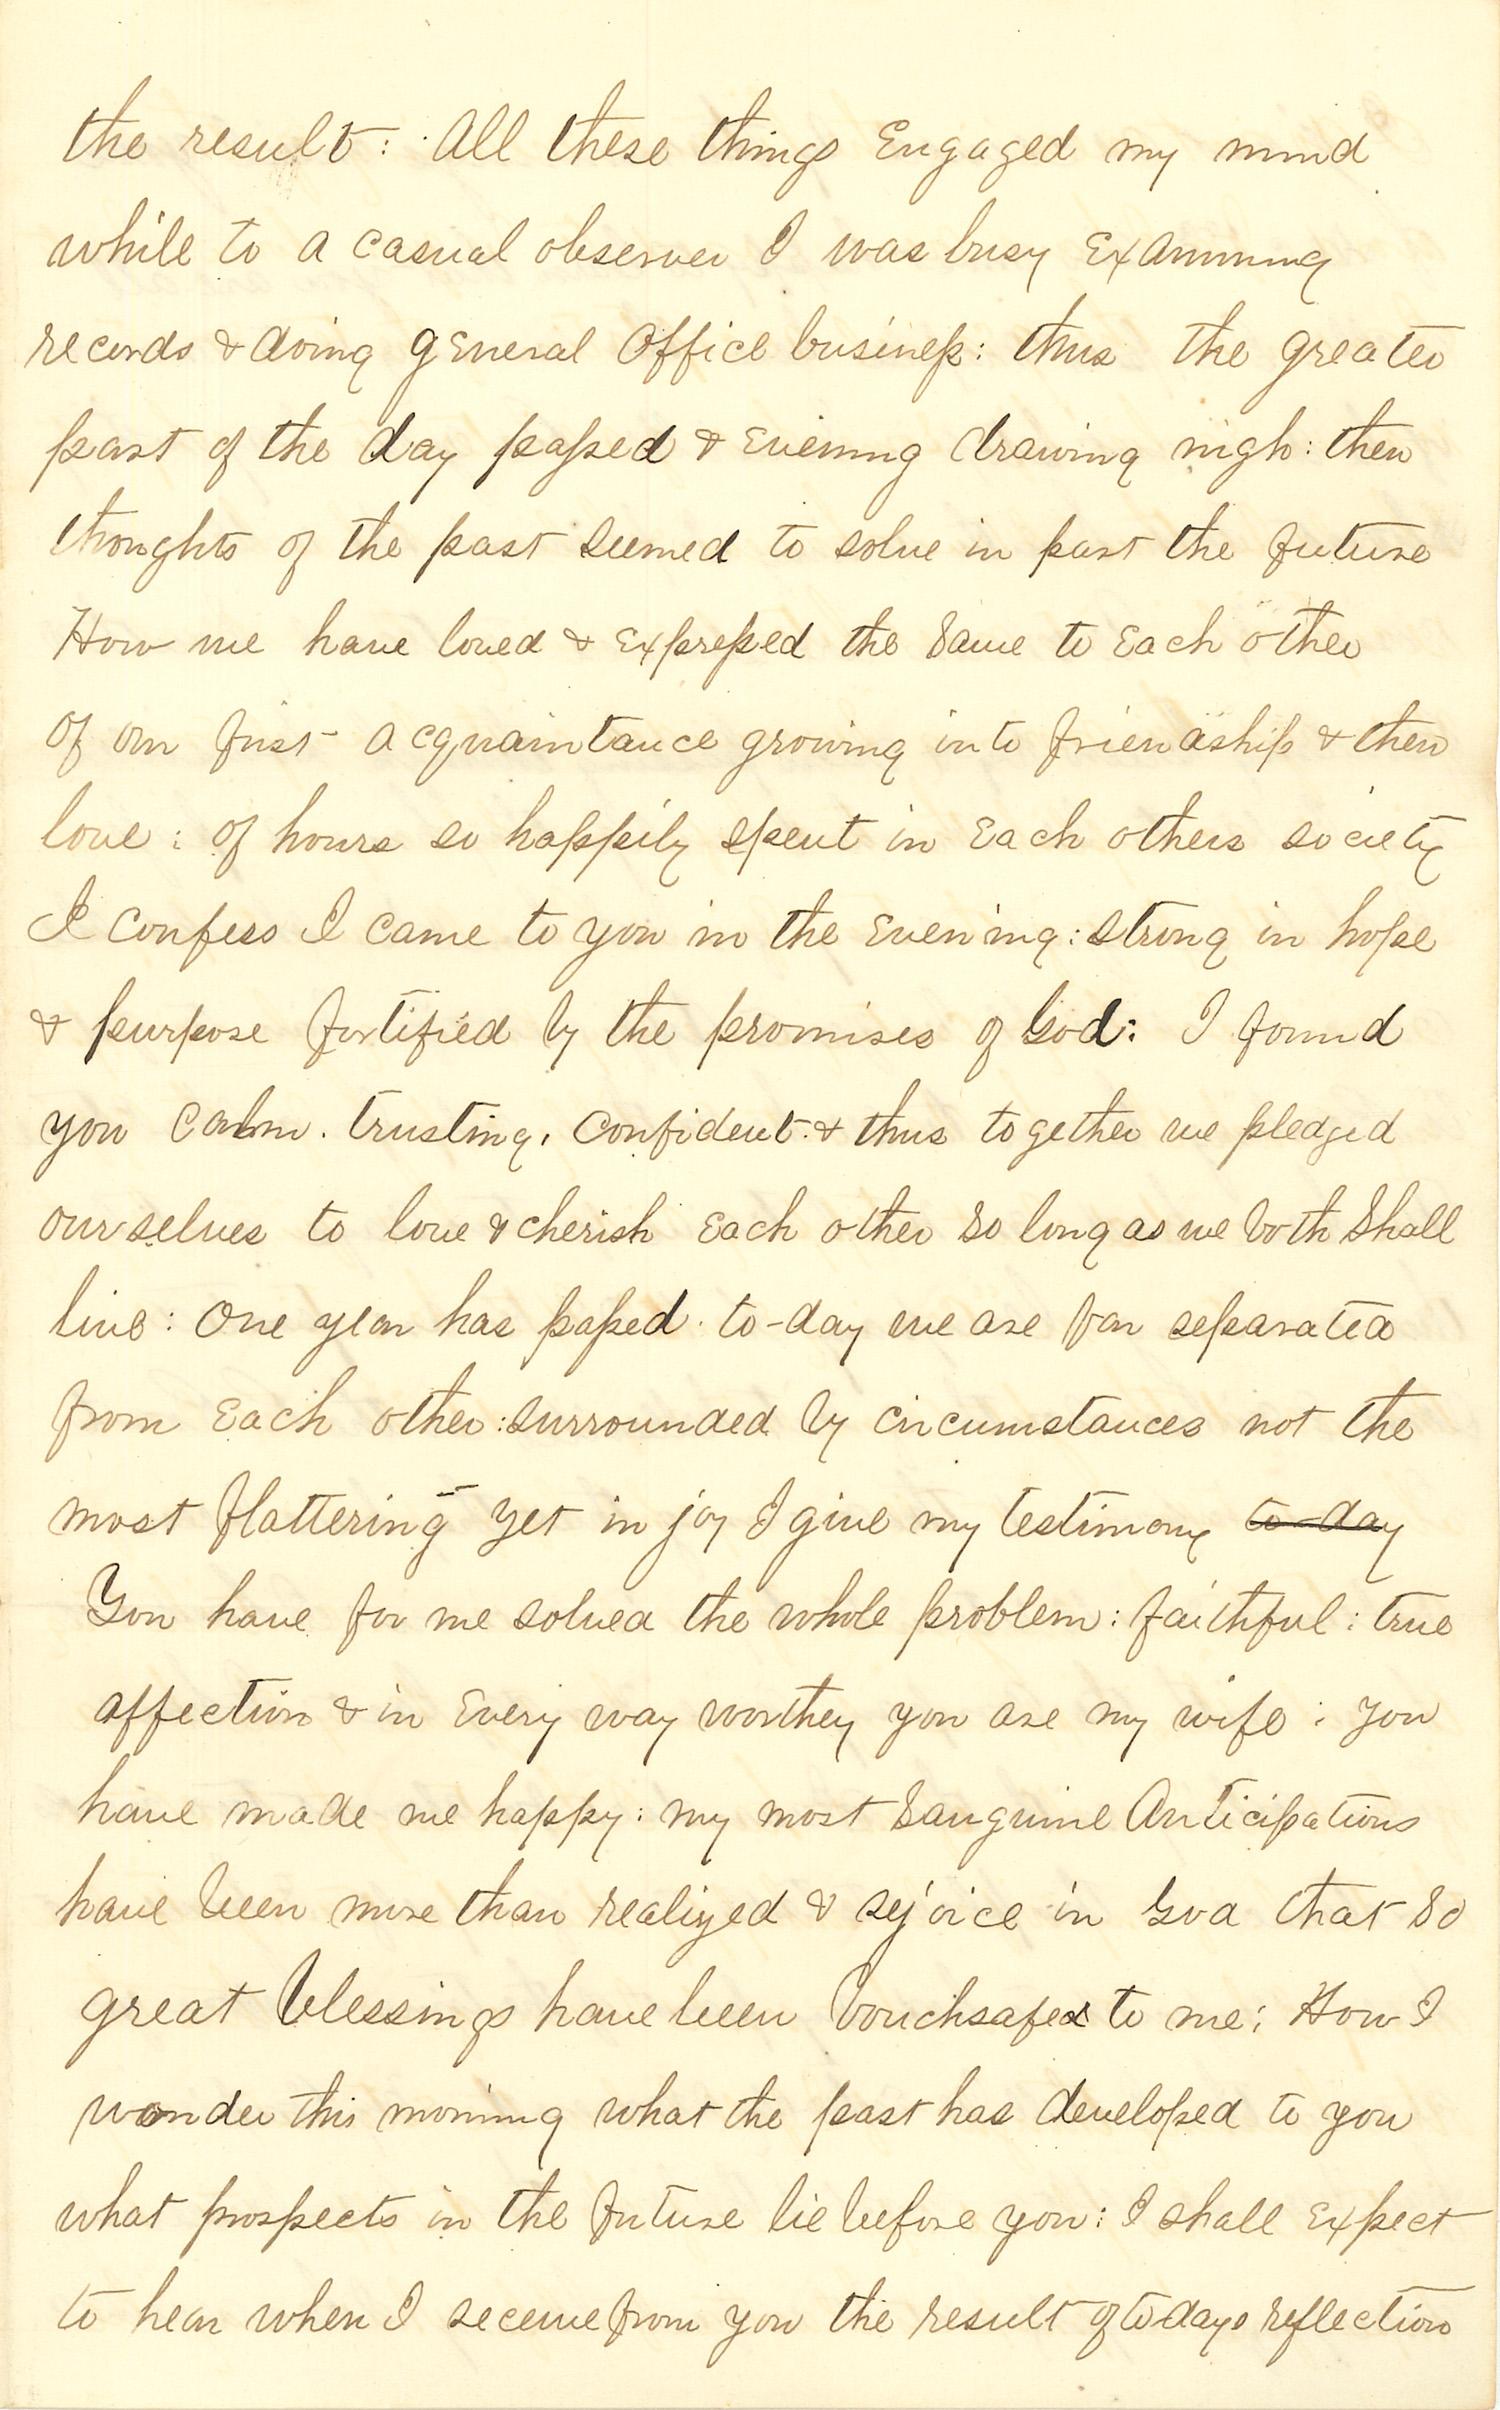 Joseph Culver Letter, December 12, 1862, Page 3